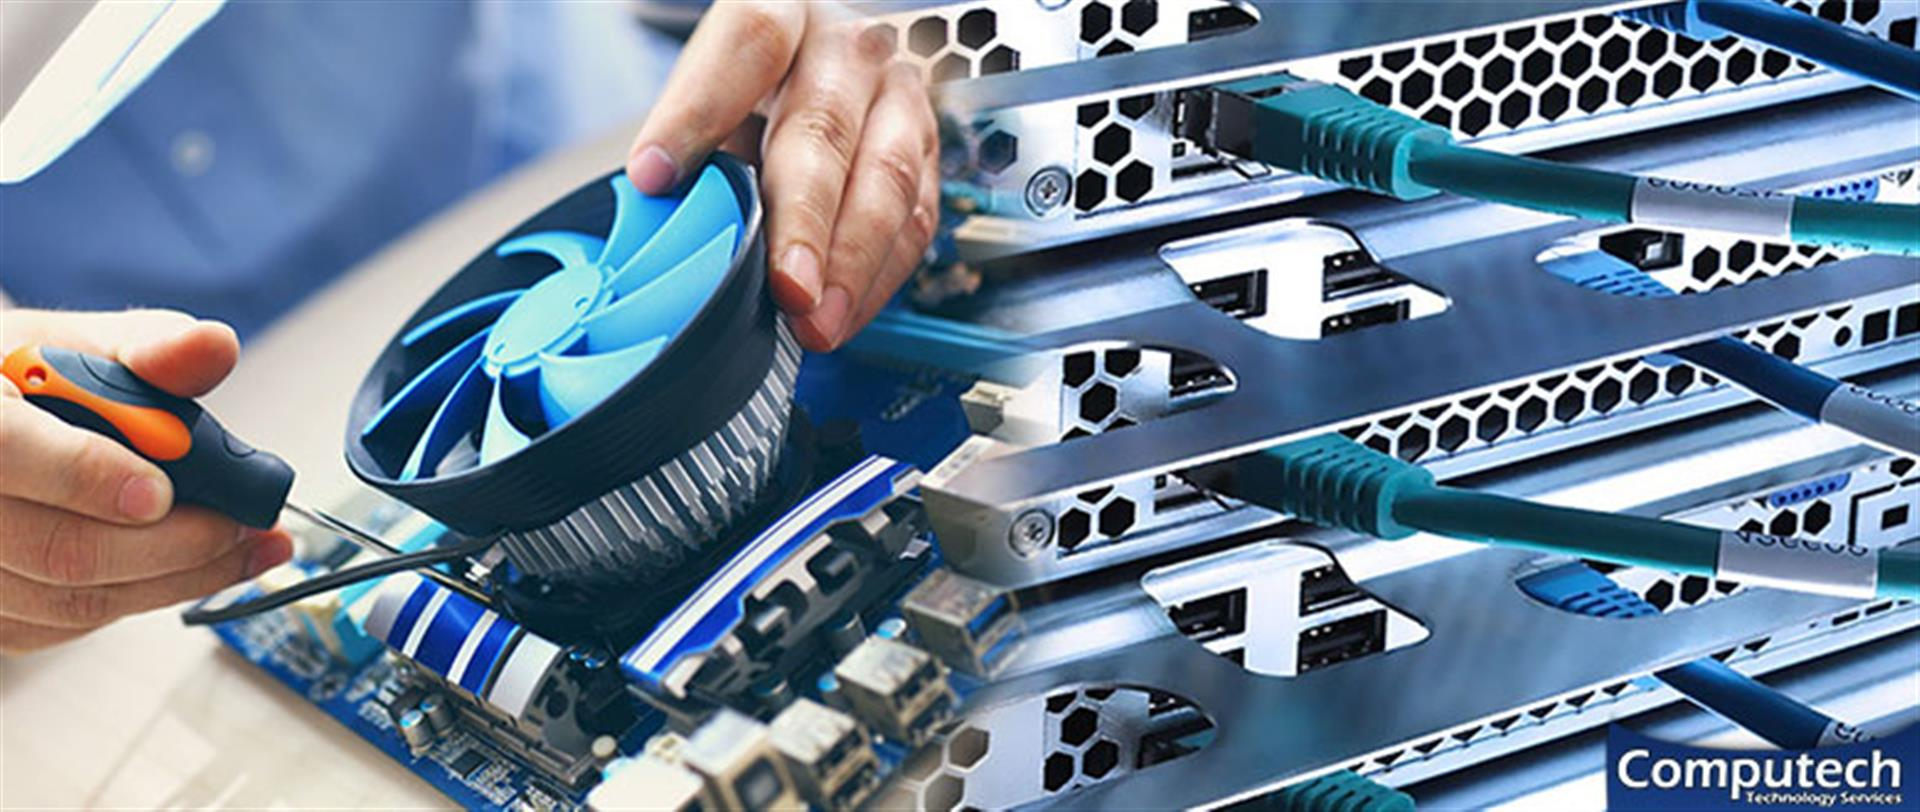 Cochran Georgia Onsite Computer & Printer Repair, Networks, Voice & Data Cabling Solutions